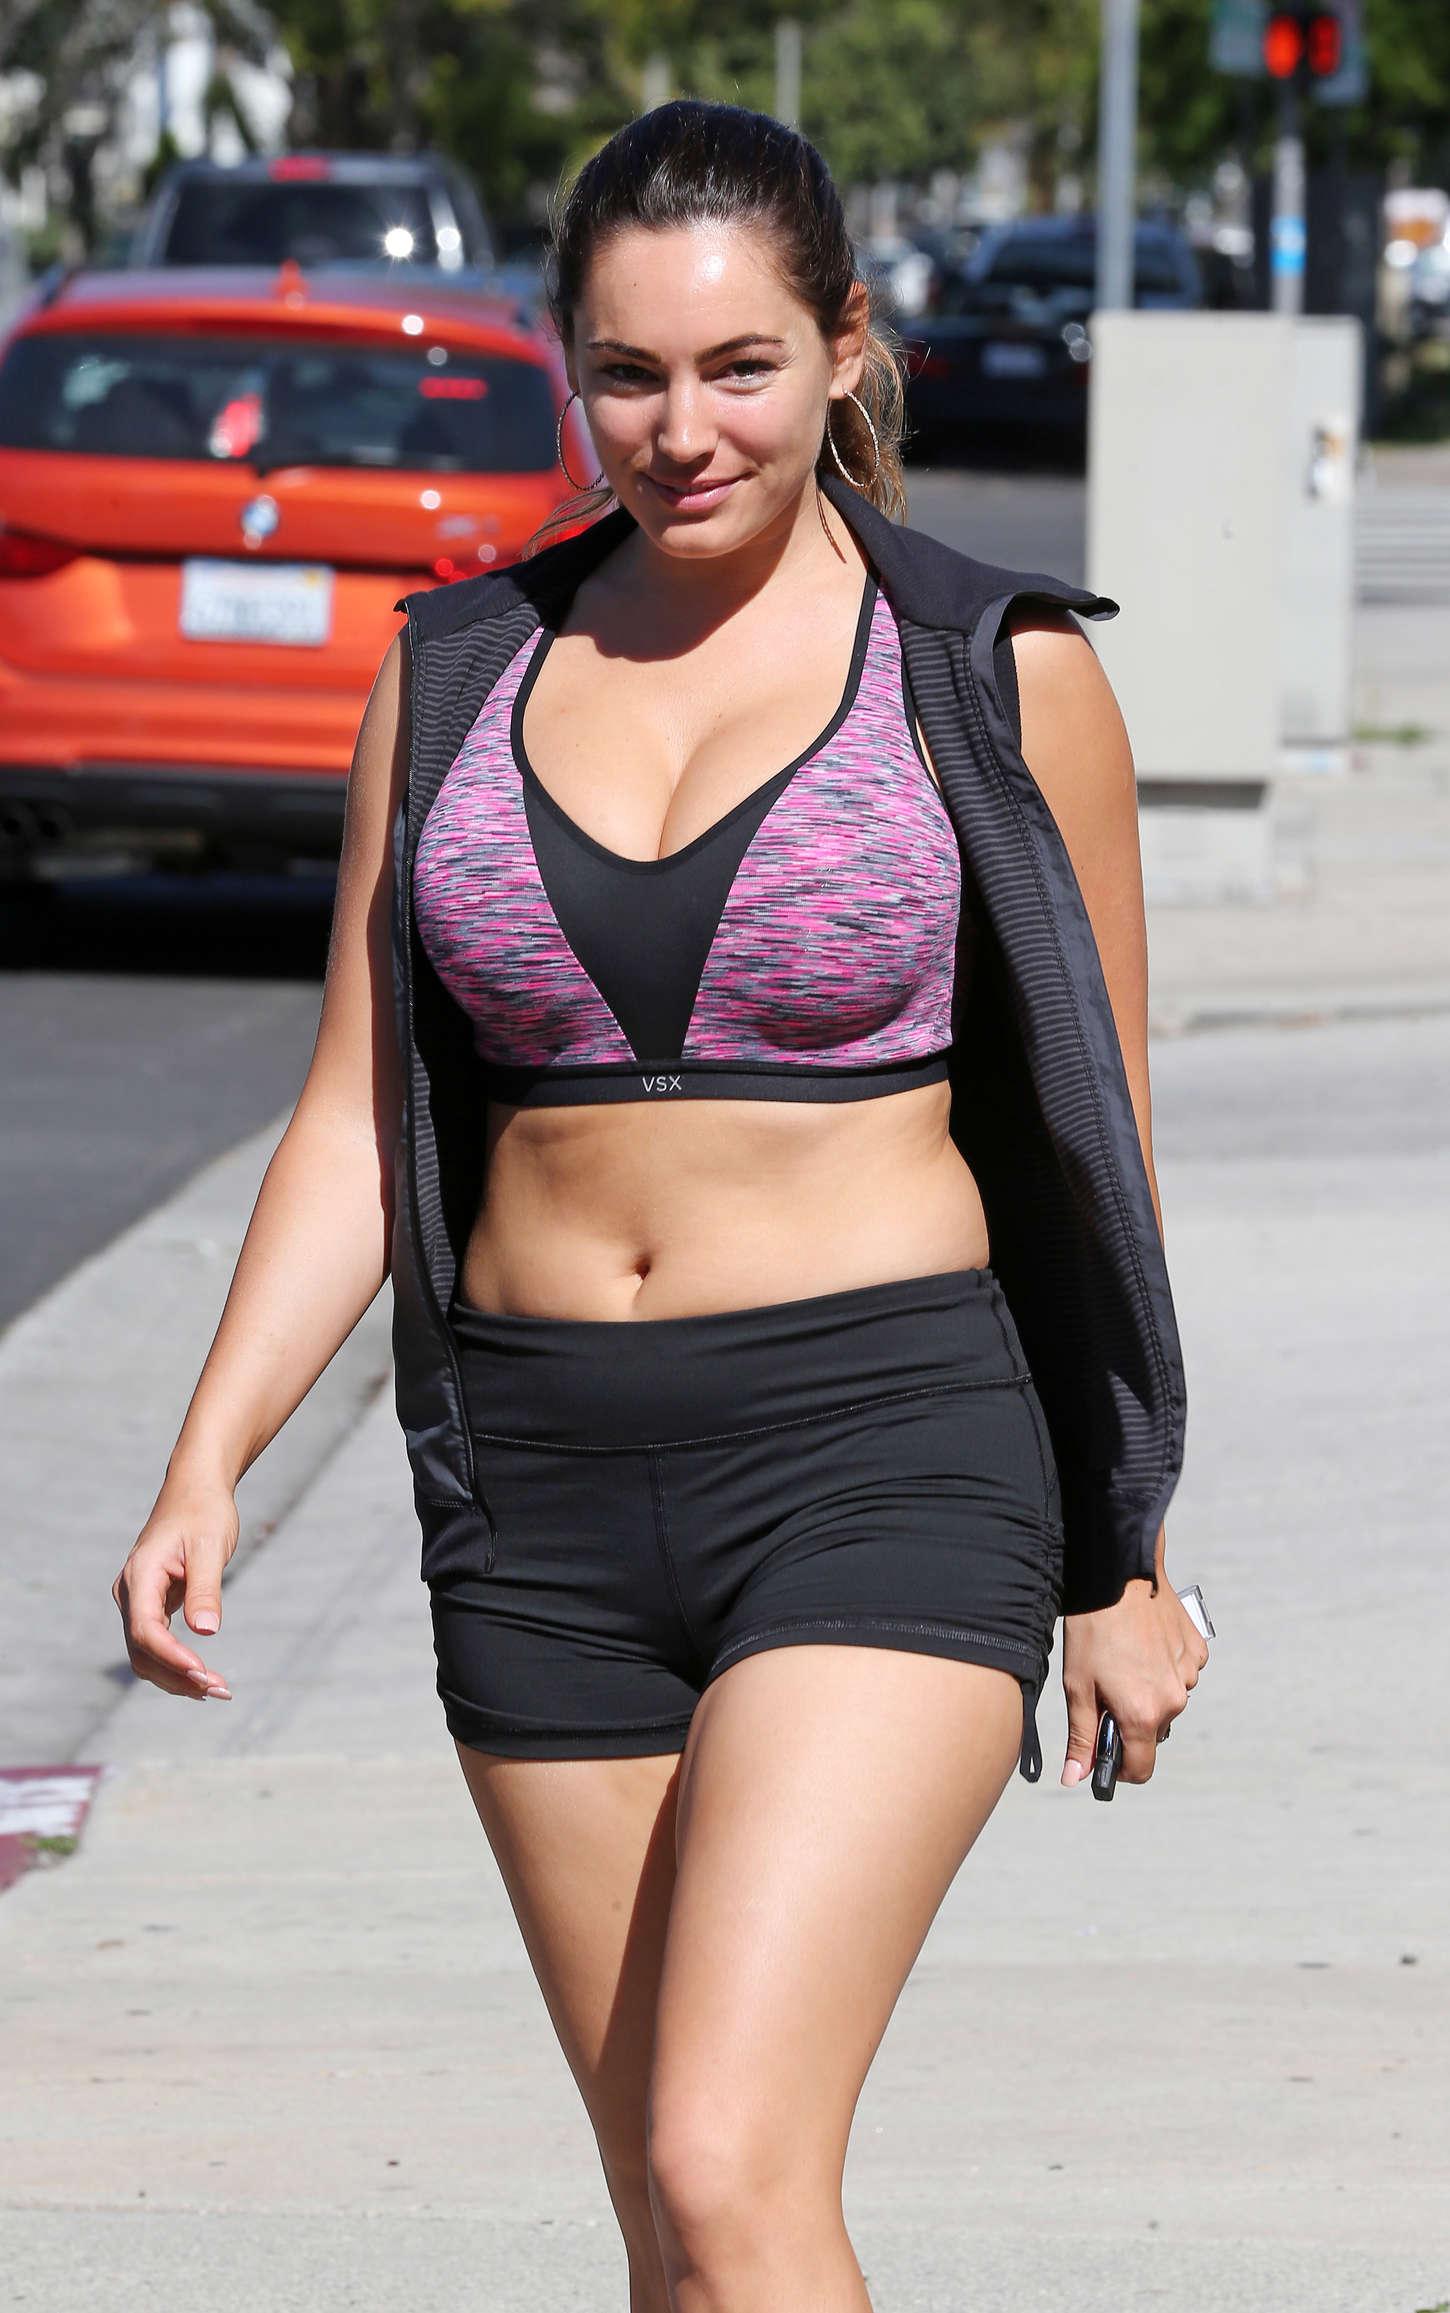 Kelly brook in tiny shorts and sports bra 18 gotceleb for 18 and tiny com